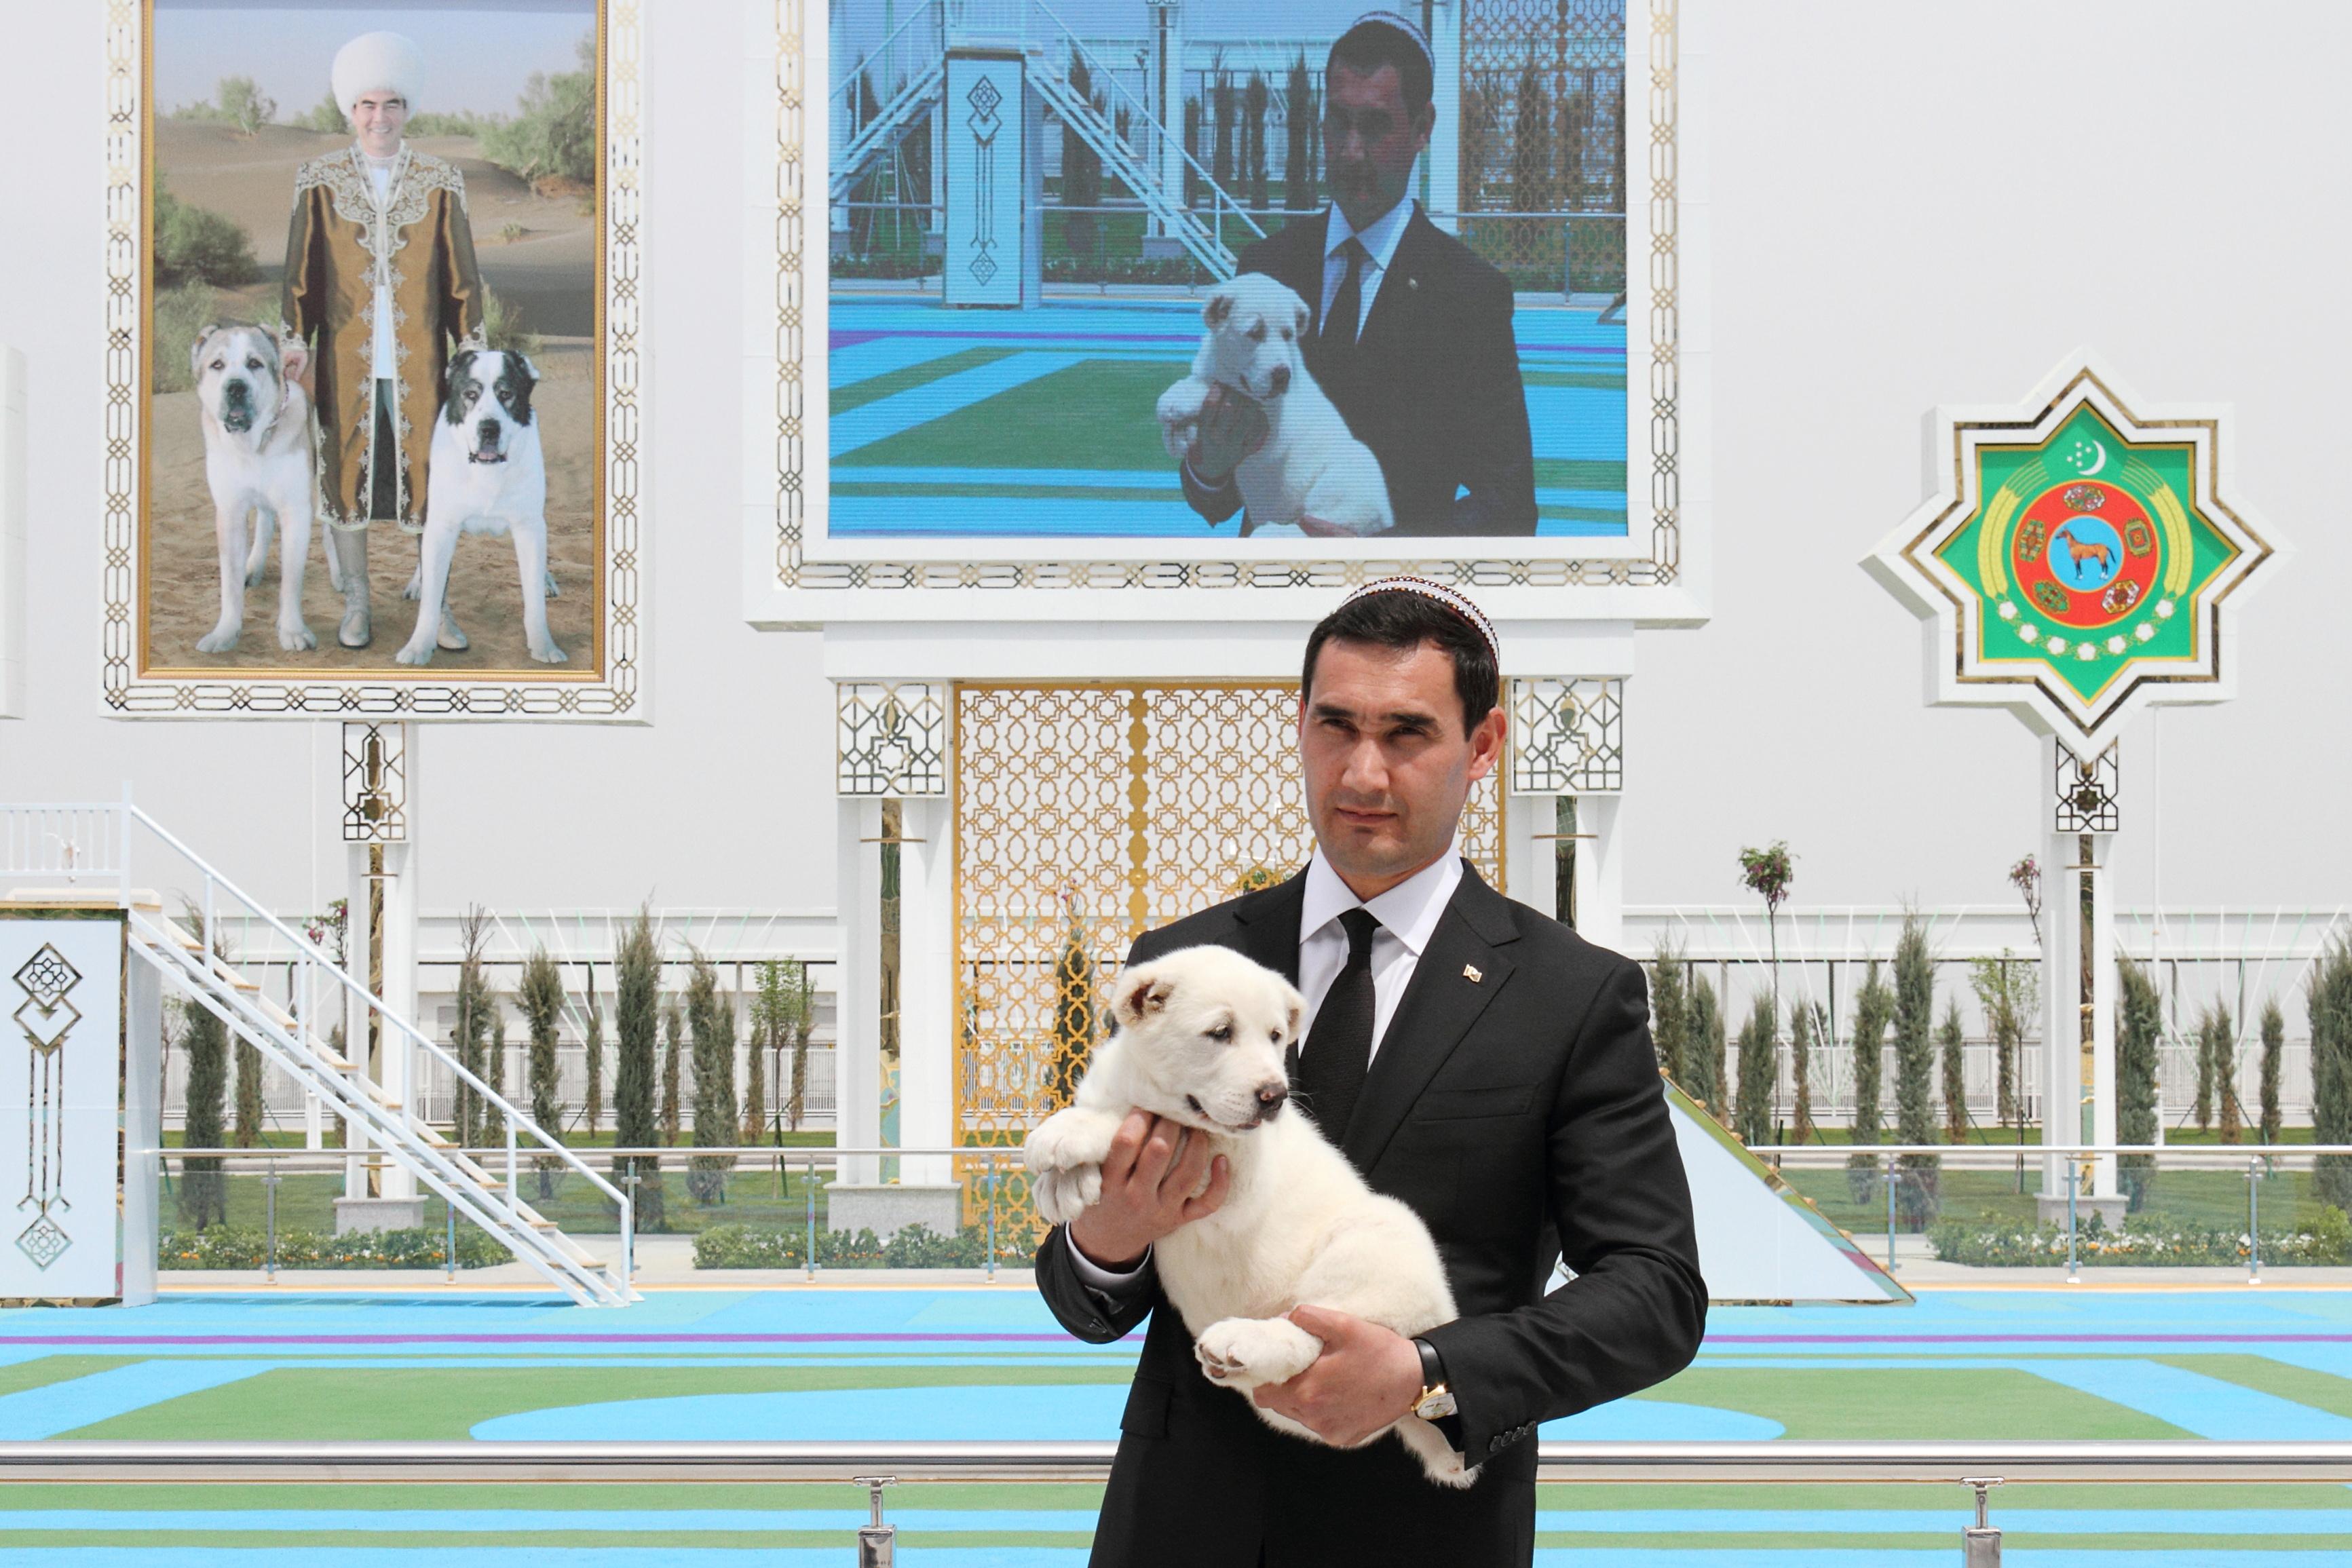 Turkmenistan's Deputy Prime Minister Serdar Berdymukhamedov, son of President Kurbanguly Berdymukhamedov, holds a puppy of a Turkmen shepherd dog, locally known as Alabai, during celebrations for the national Turkmen Horse Day and the Turkmen Shepherd Dog Day, near Ashgabat, Turkmenistan April 25, 2021. REUTERS/Vyacheslav Sarkisyan